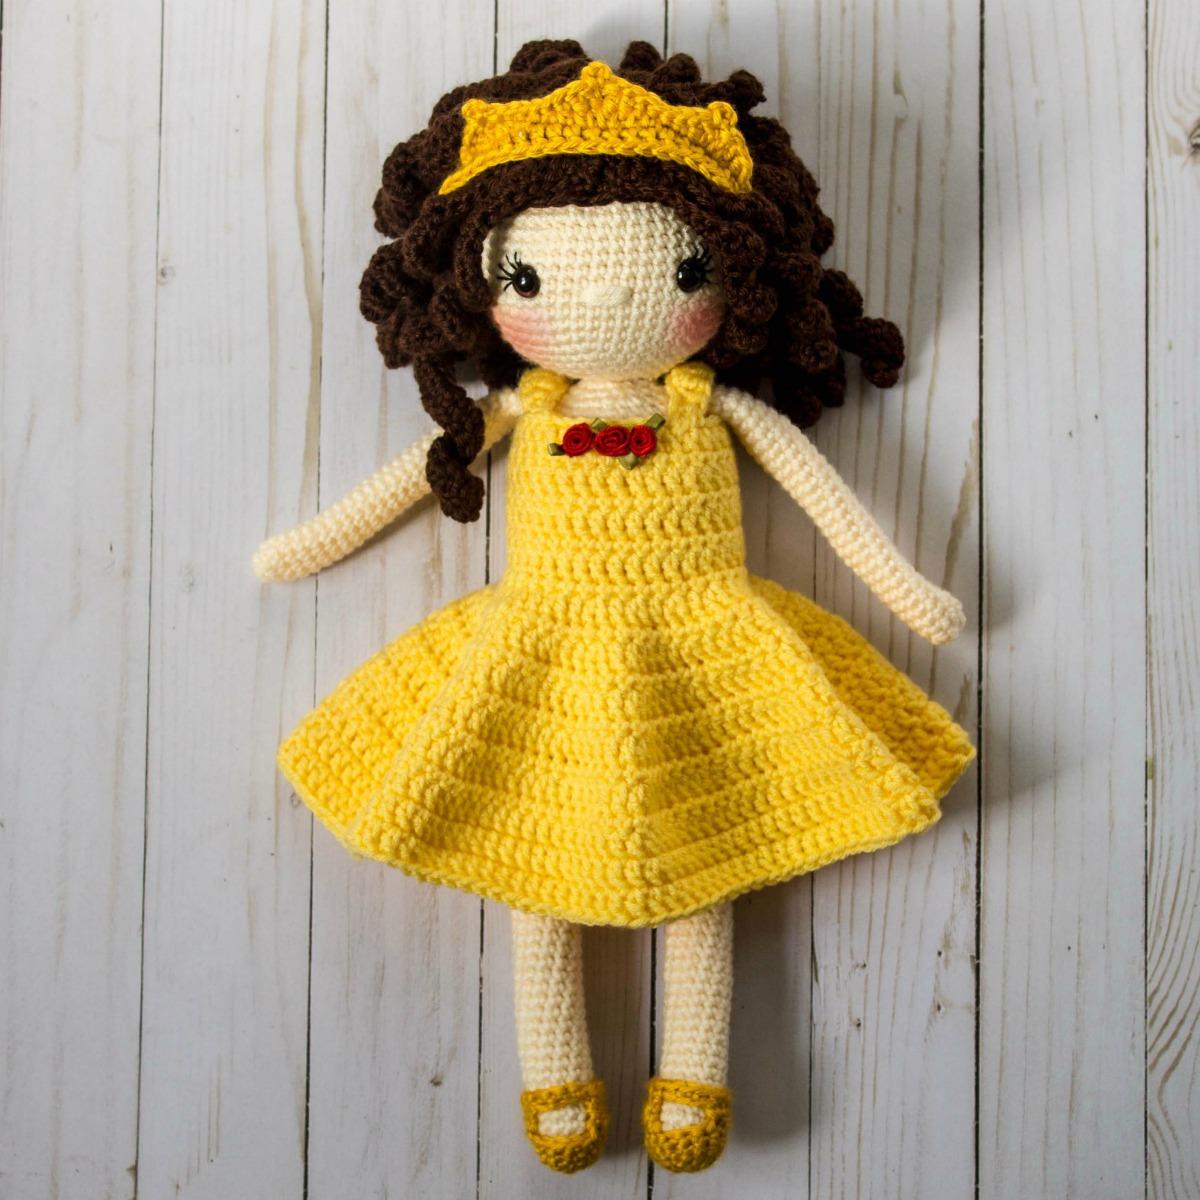 Designing Crochet Doll Patterns For You – thefashiontamer.com | 1200x1200